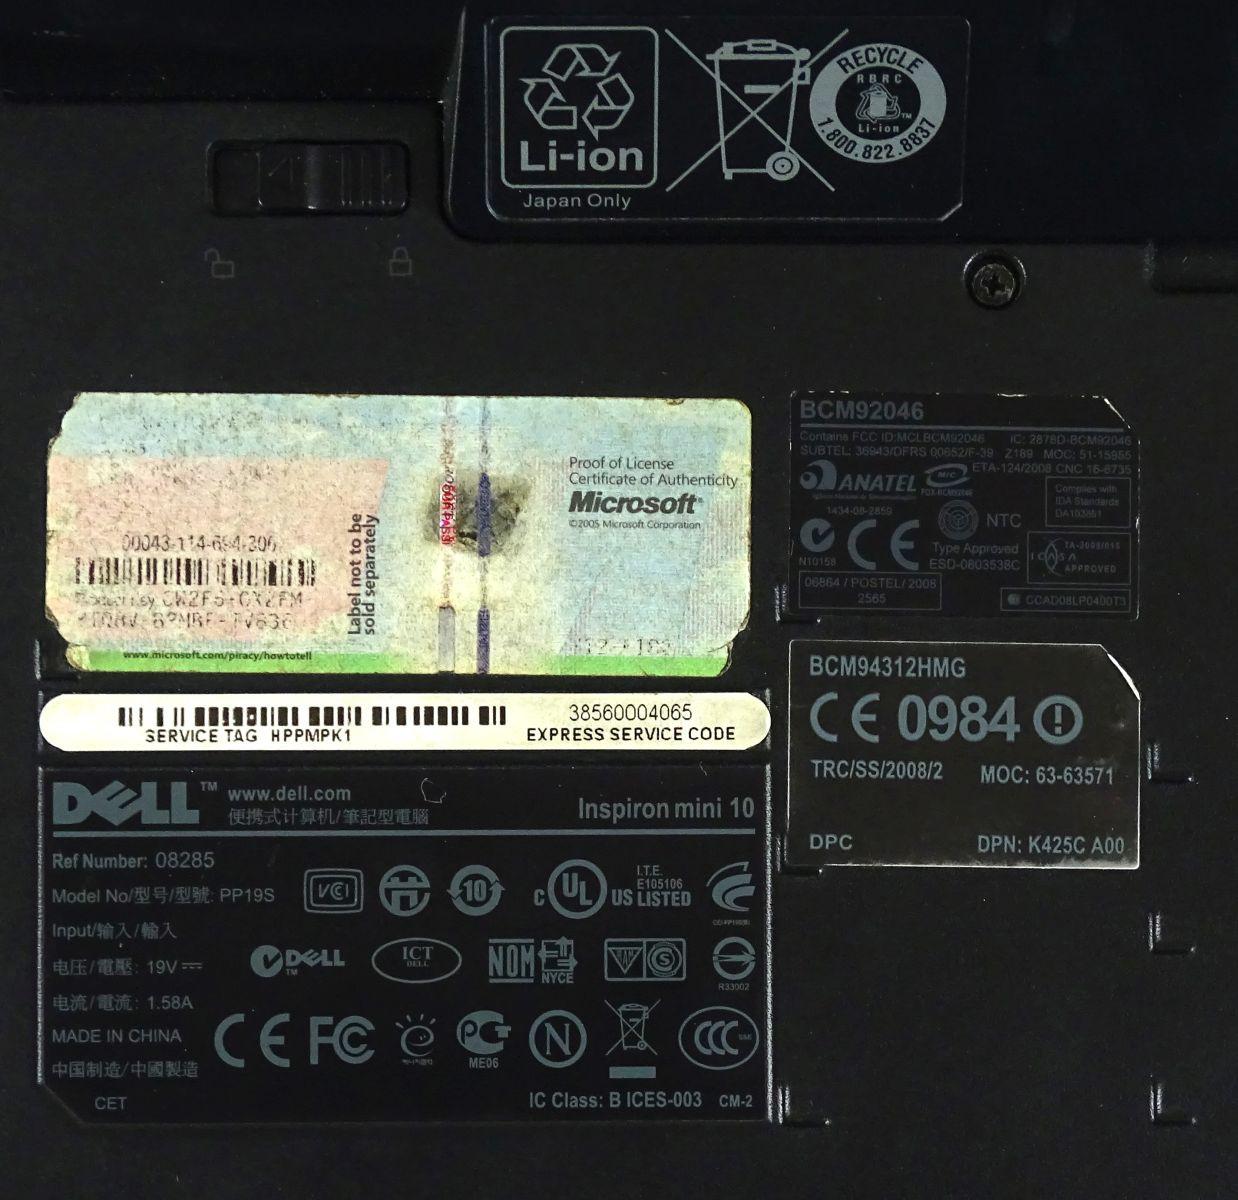 DSC00352.JPG (1238×1200)